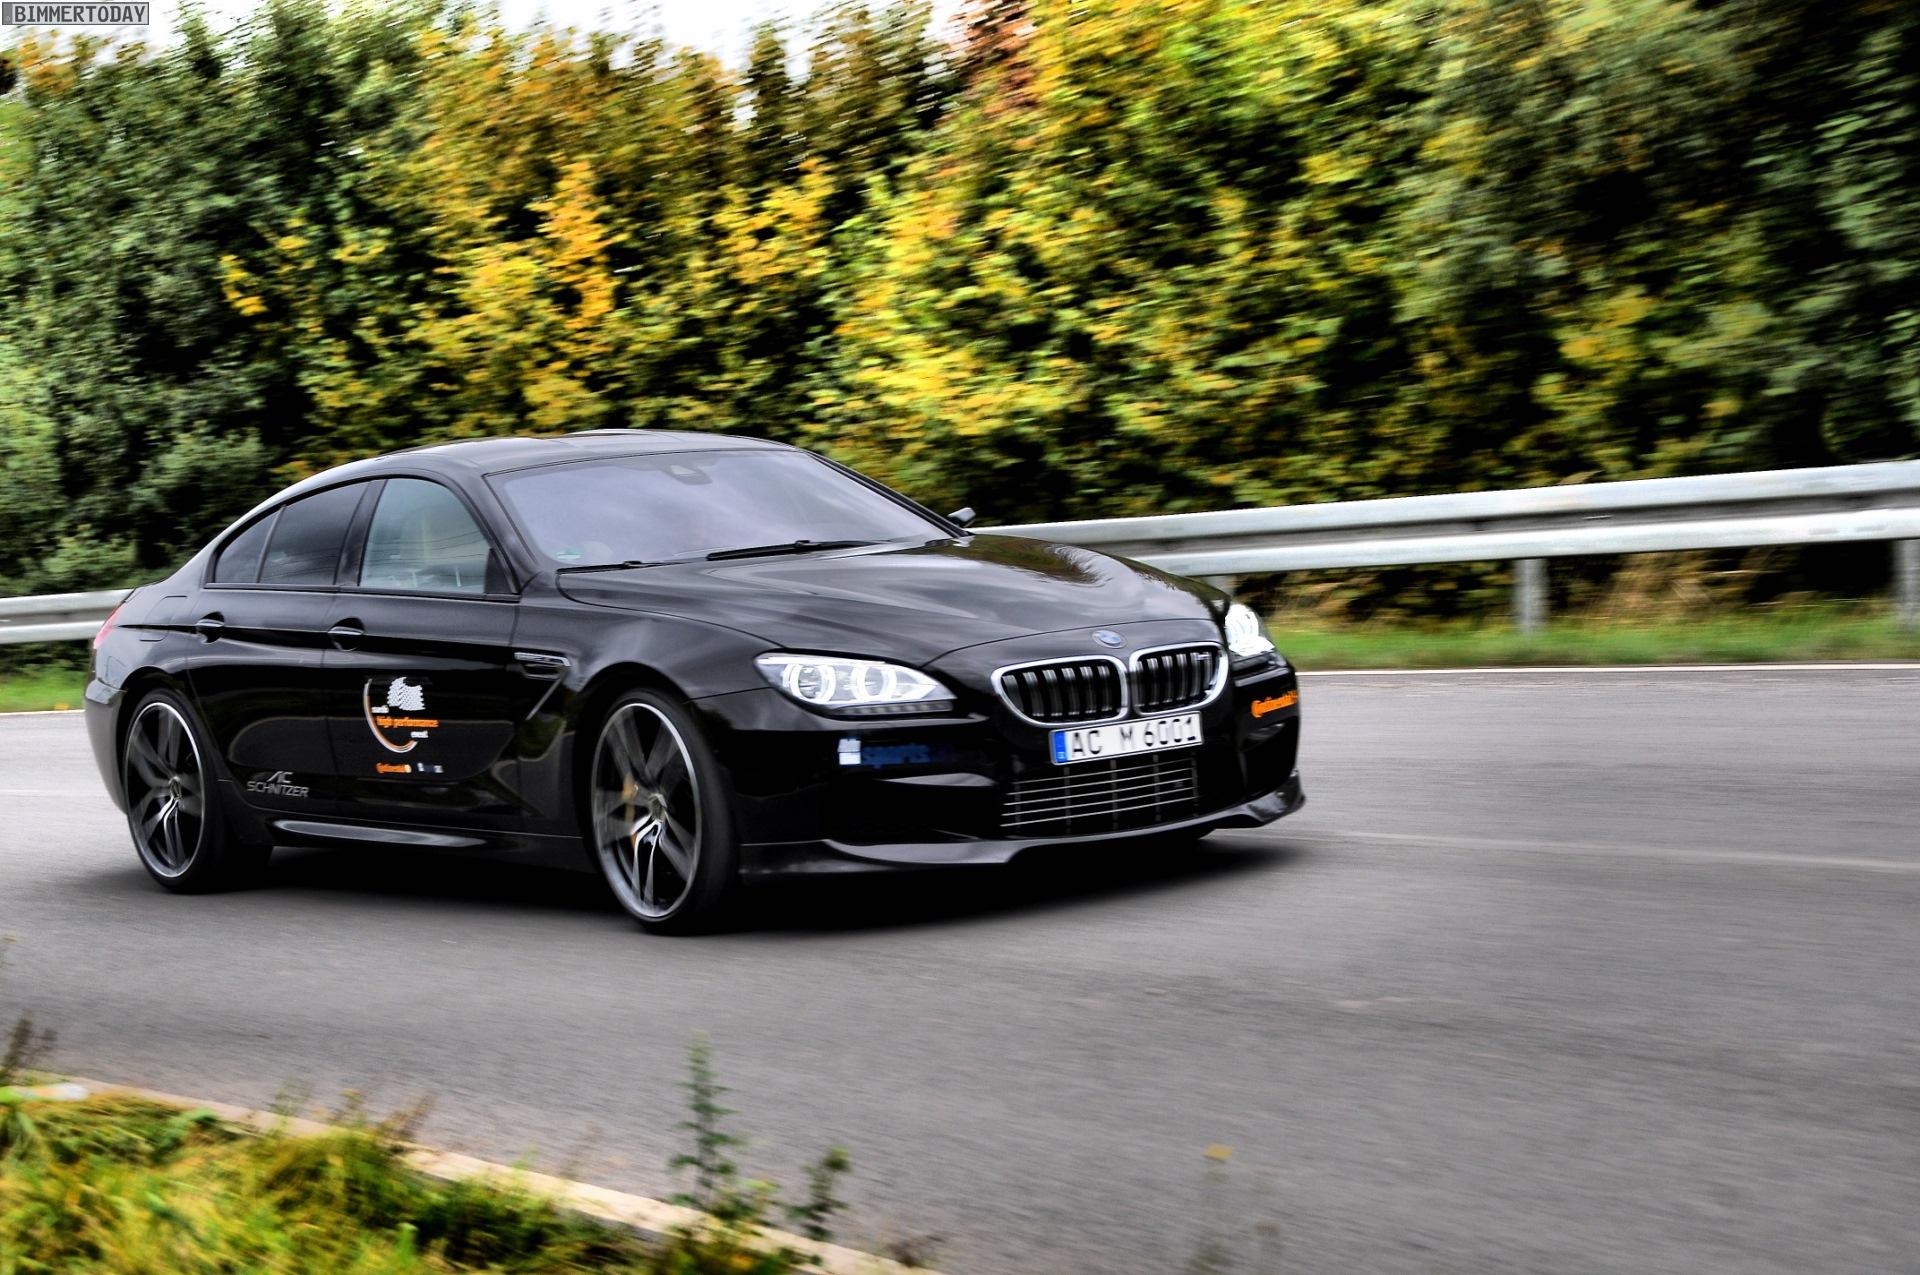 AC Schnitzer BMW M6 Gran Coupe Nardo High Speed Tuning Test 04